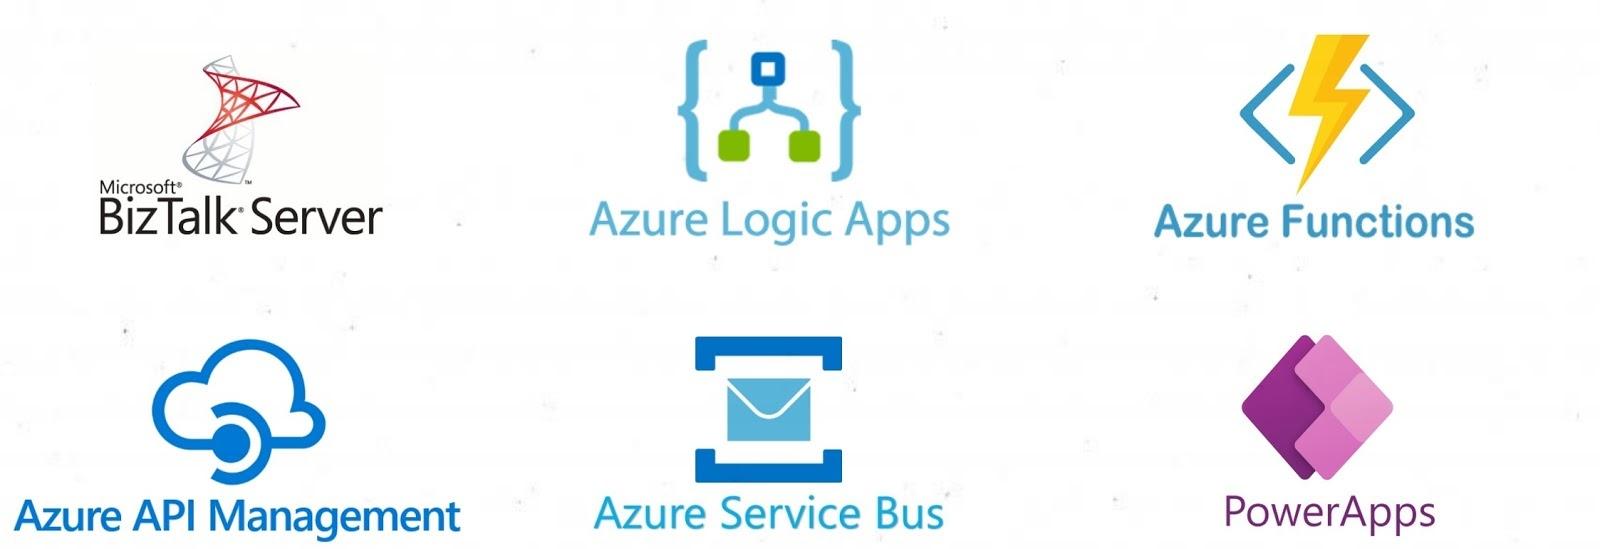 May 10, 2021 Weekly Update on Microsoft Integration Platform & Azure iPaaS